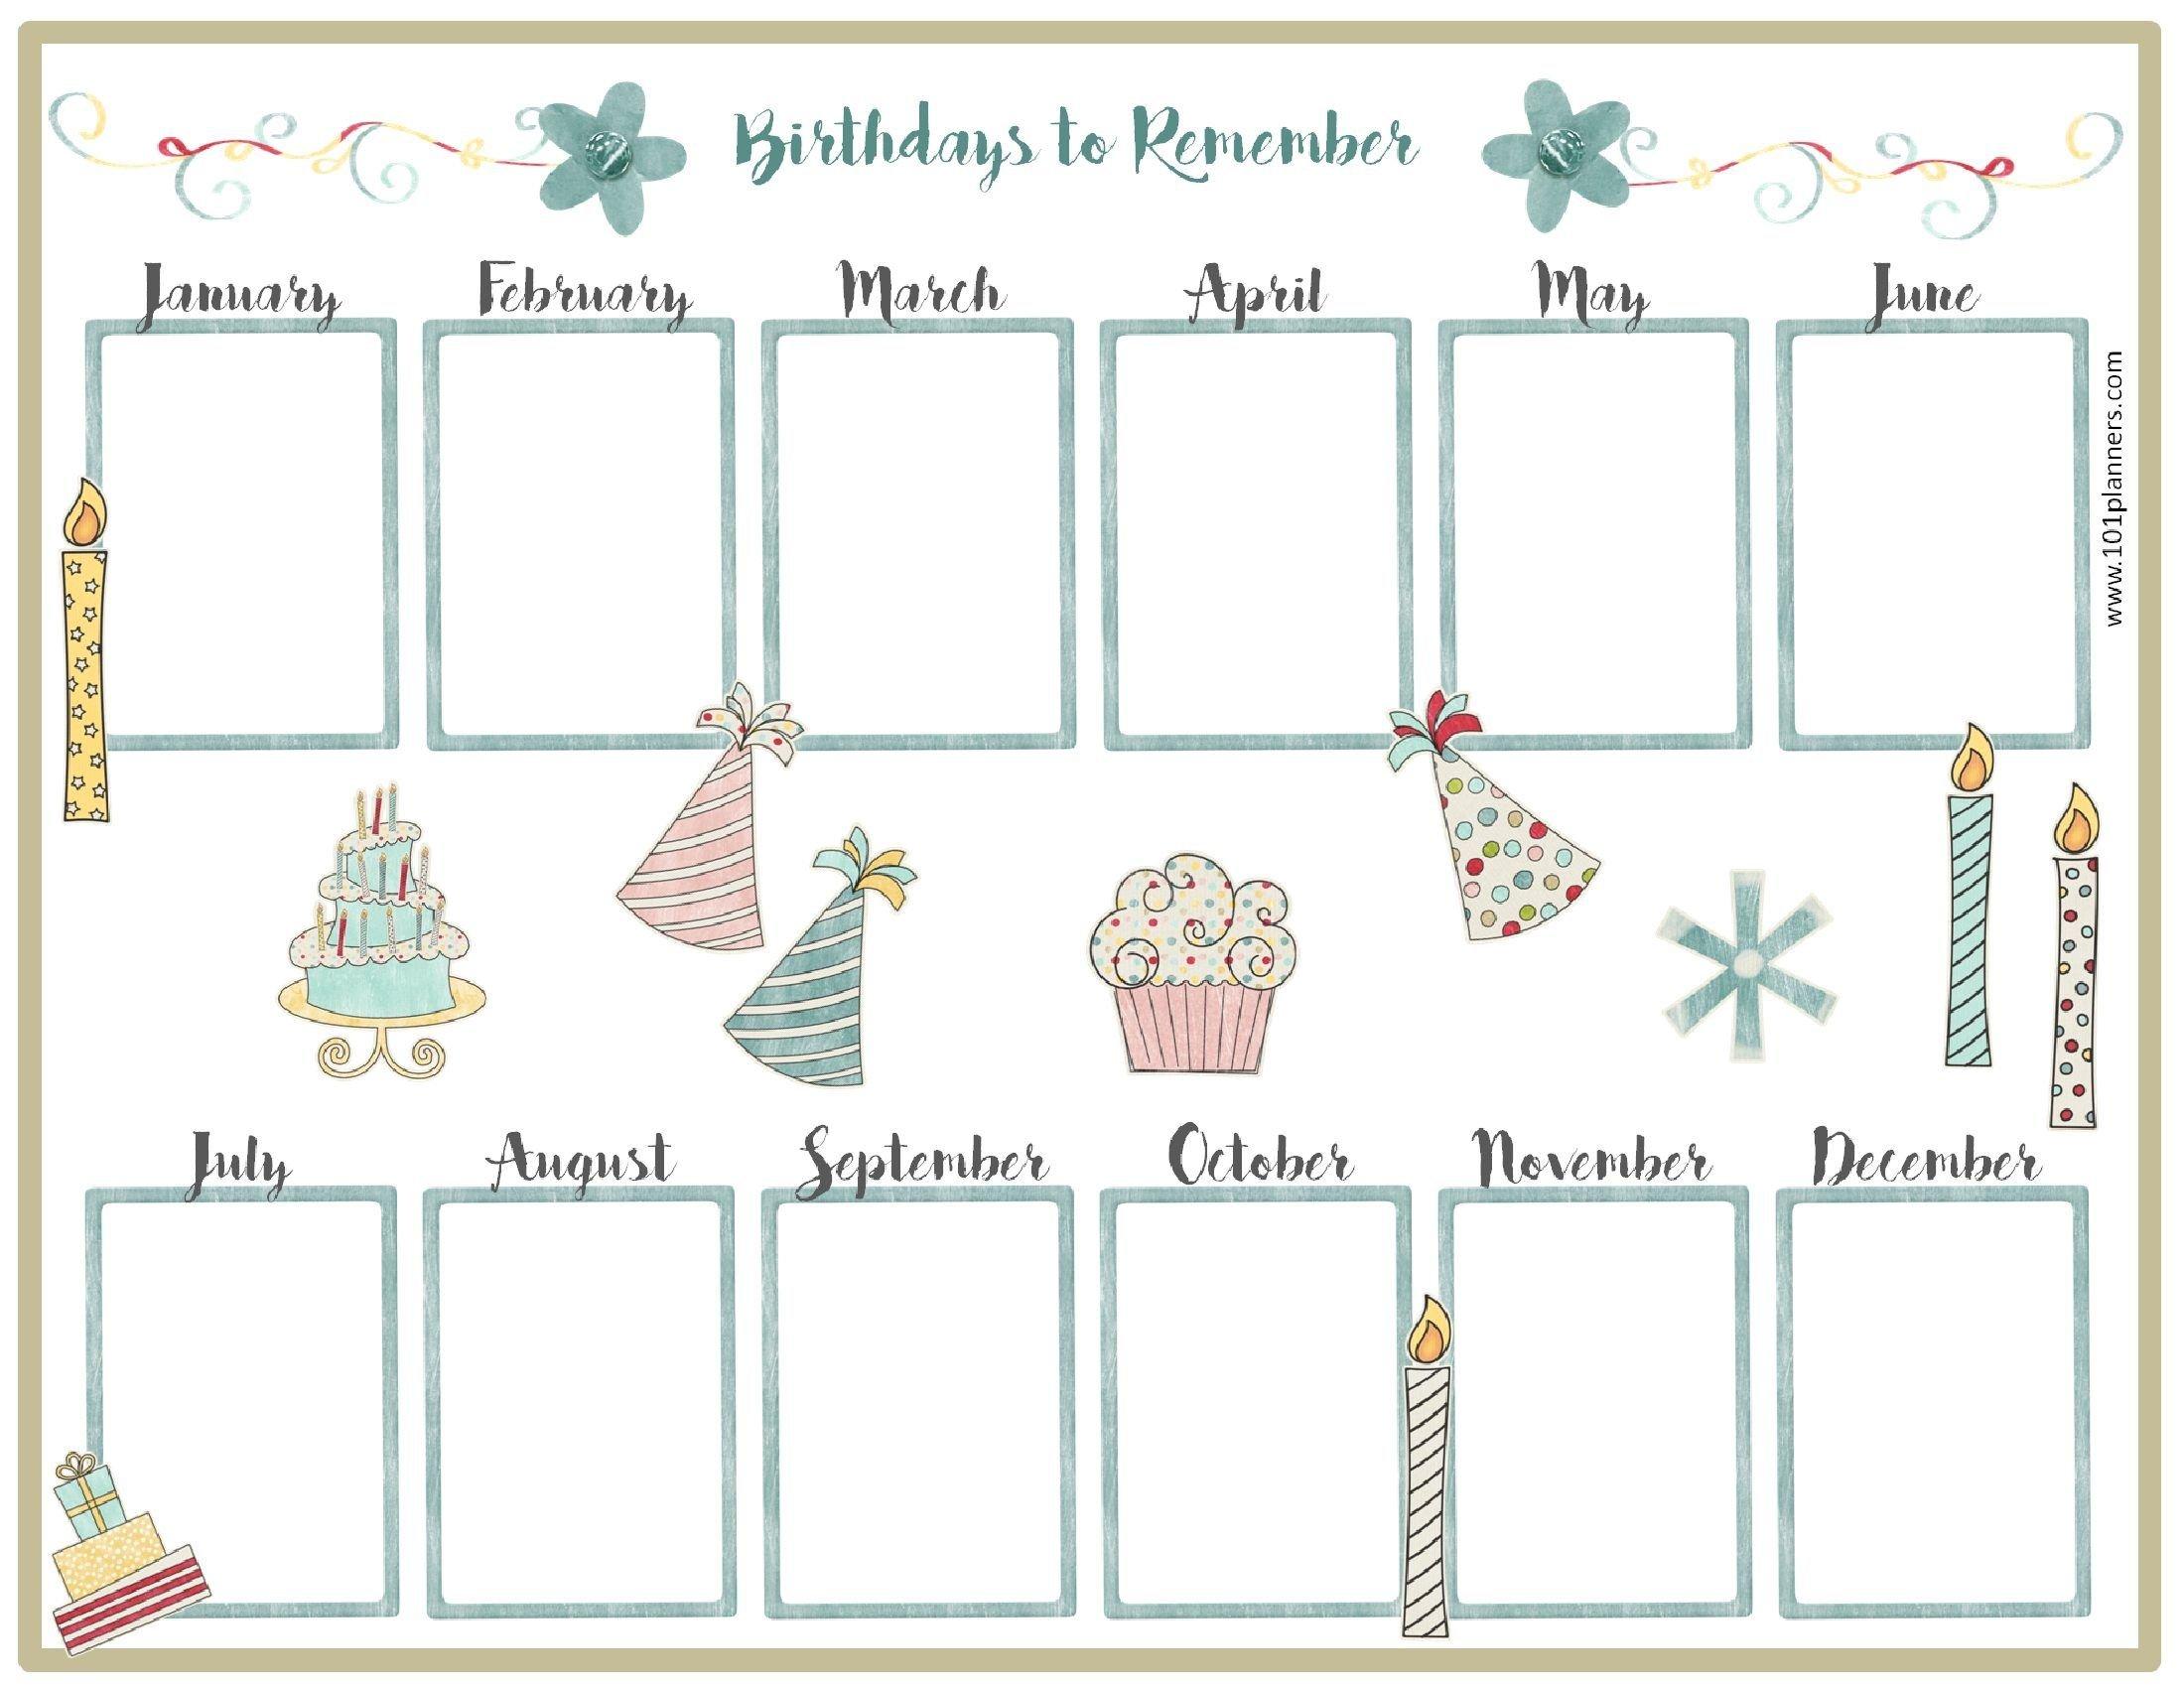 Birthday Calendar Template (С Изображениями) | День Рождения Birthday Calendar Fill In Online